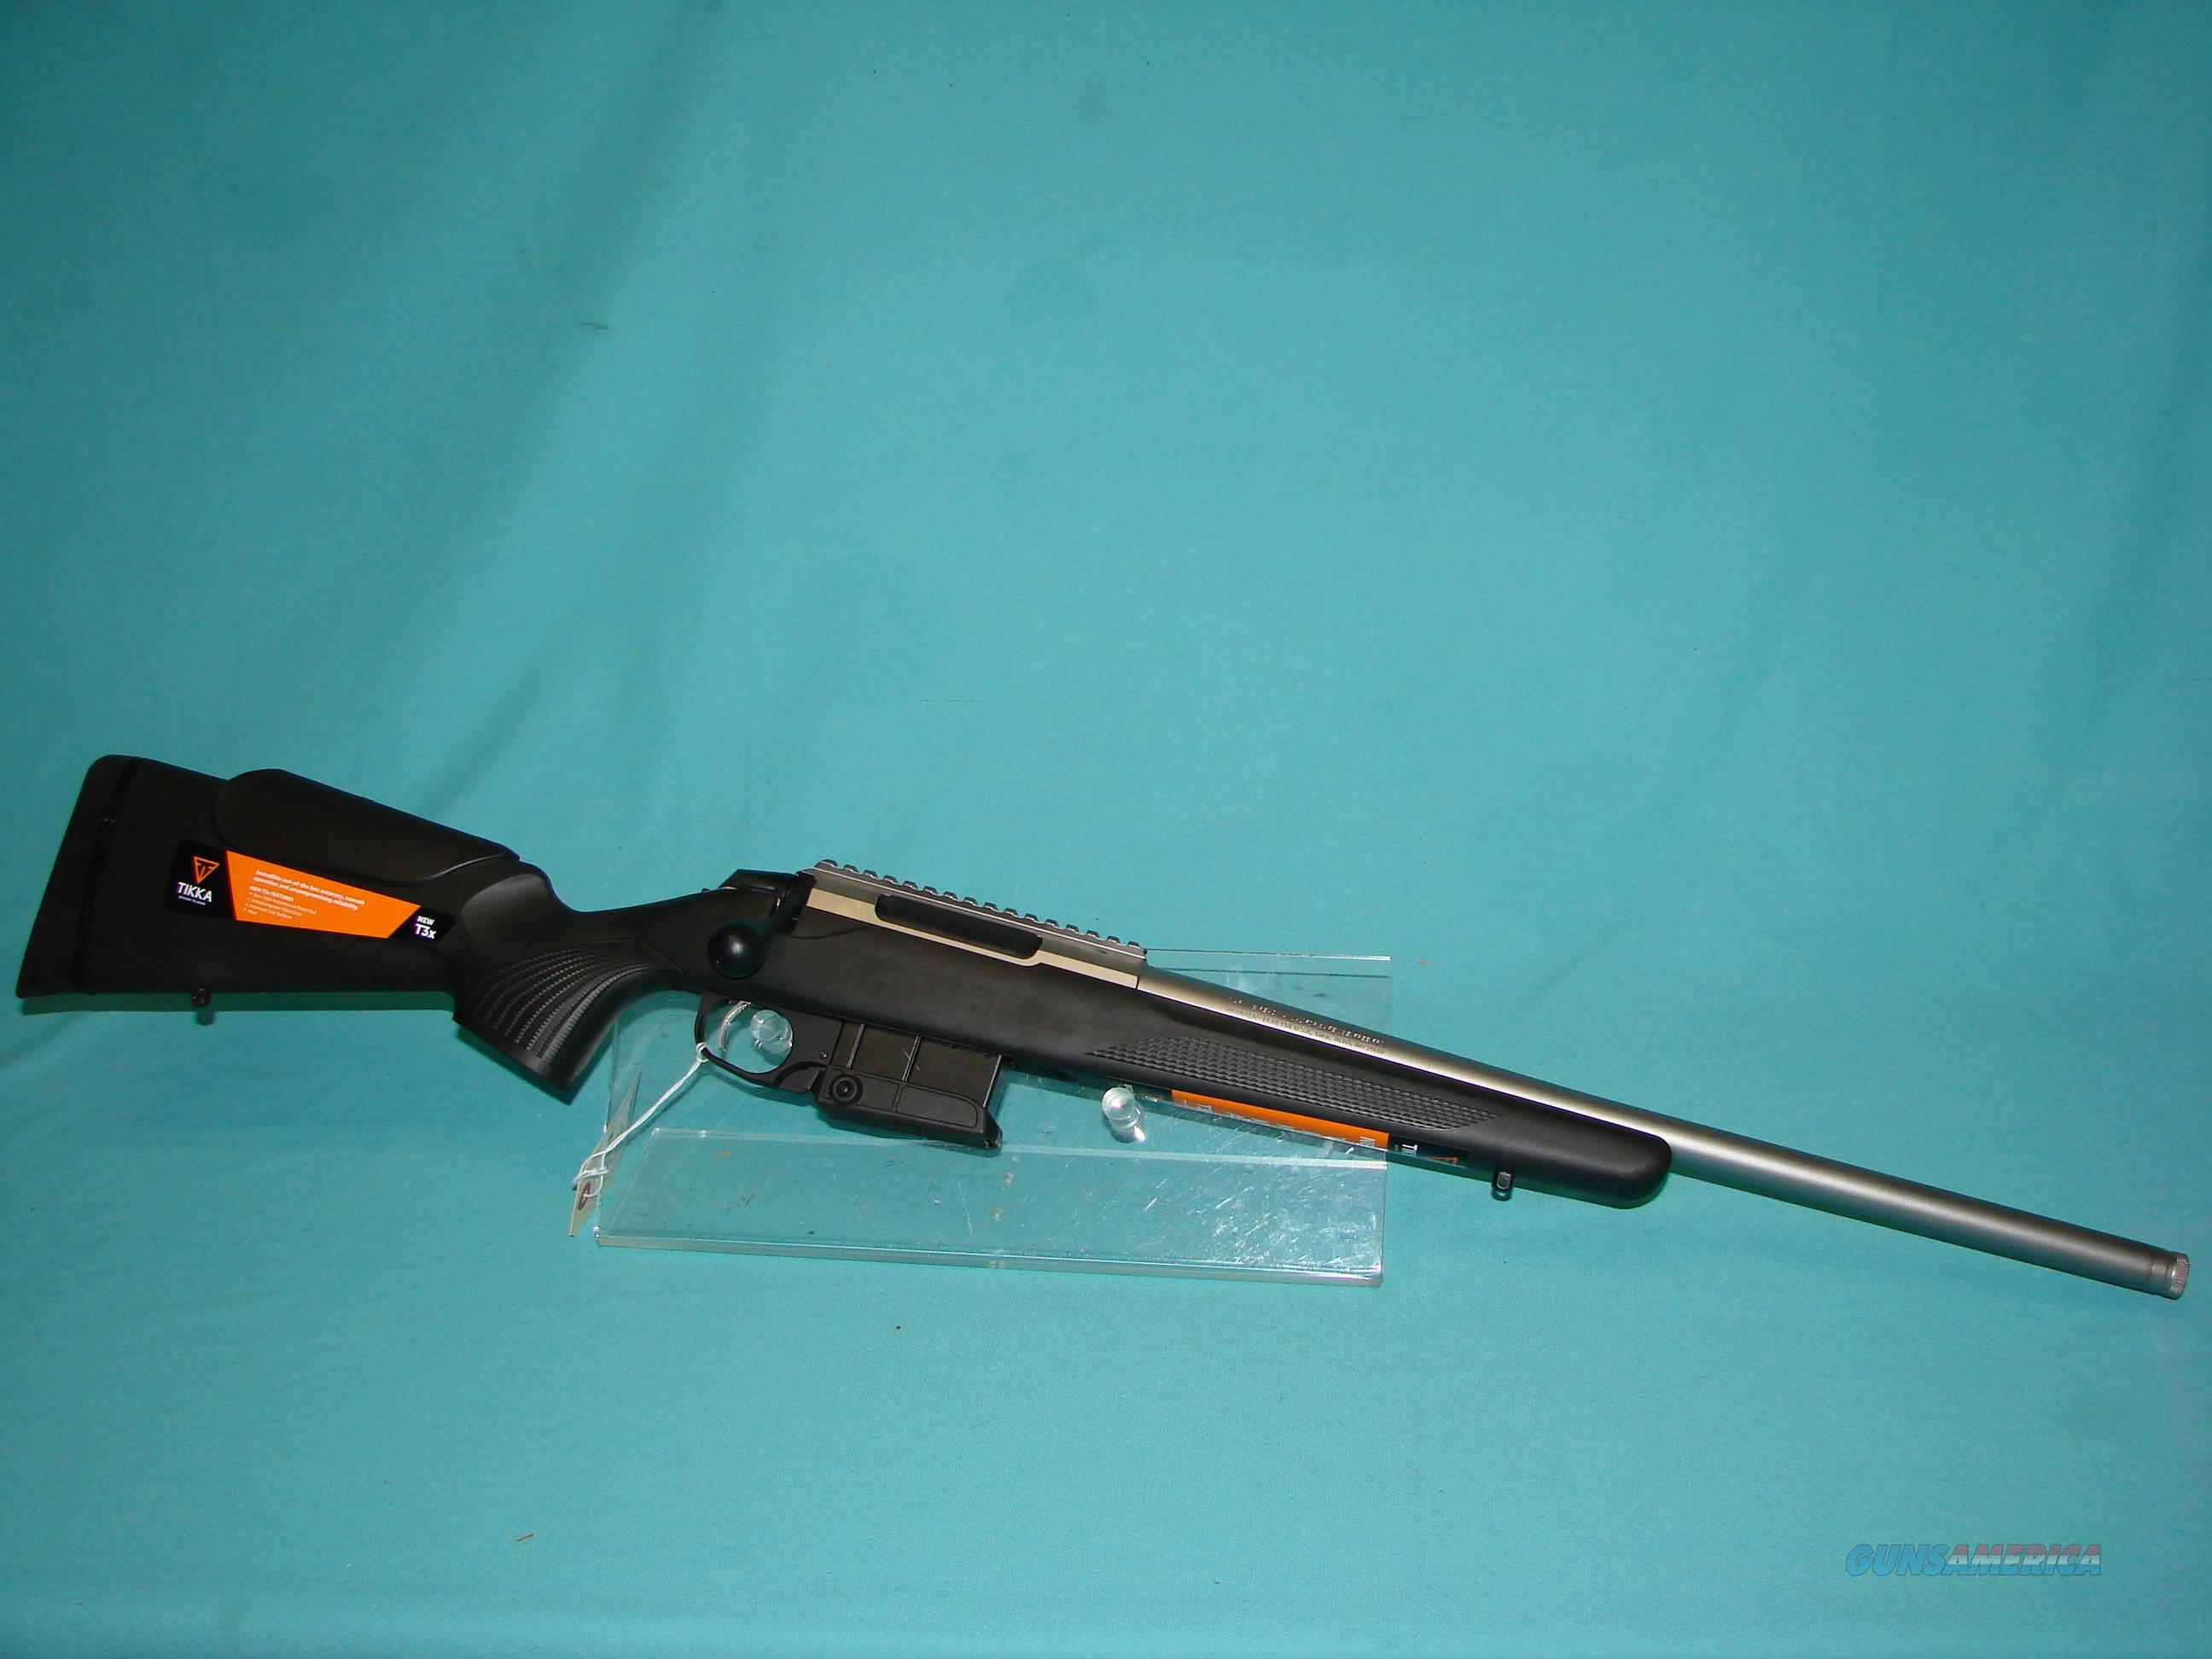 Tikka T3X CTR  Guns > Rifles > Tikka Rifles > Other